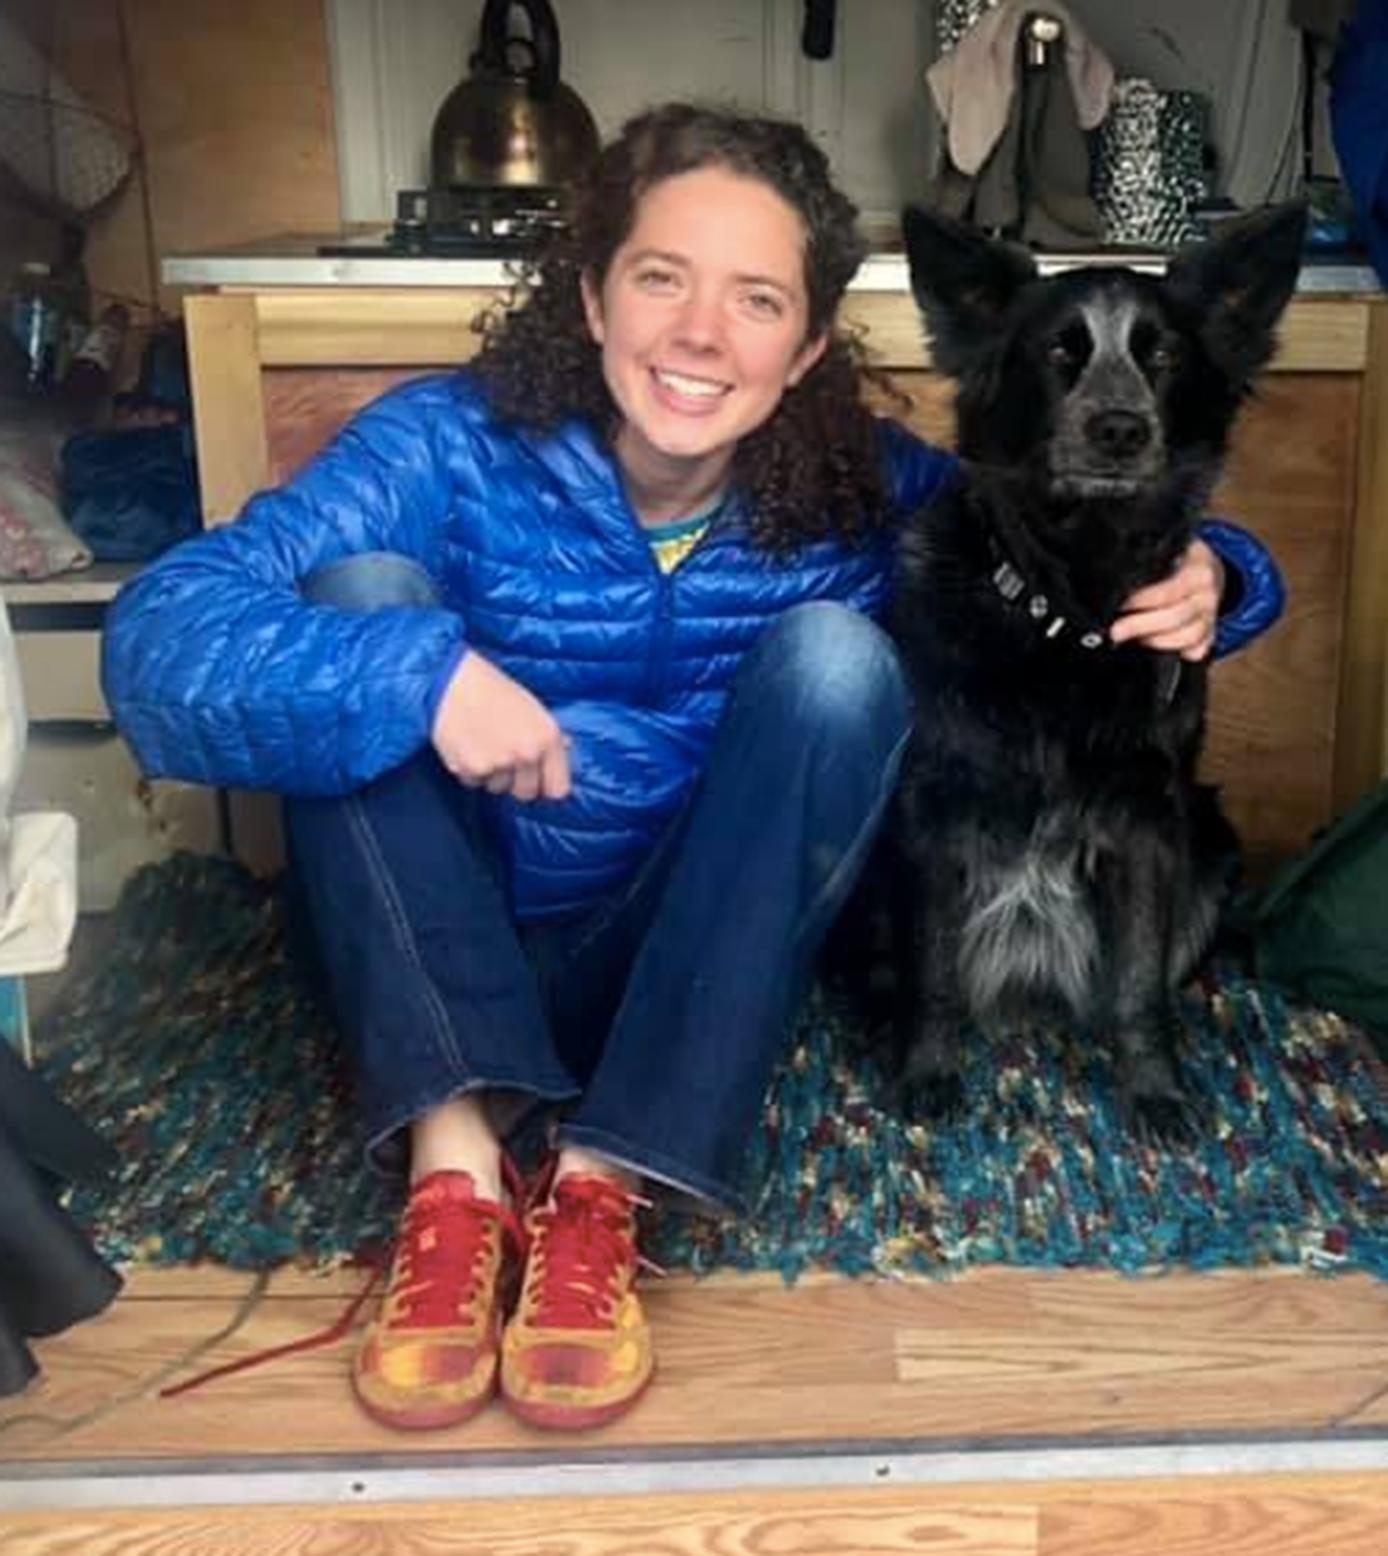 Abbie Weeks in her converted camper van with her dog